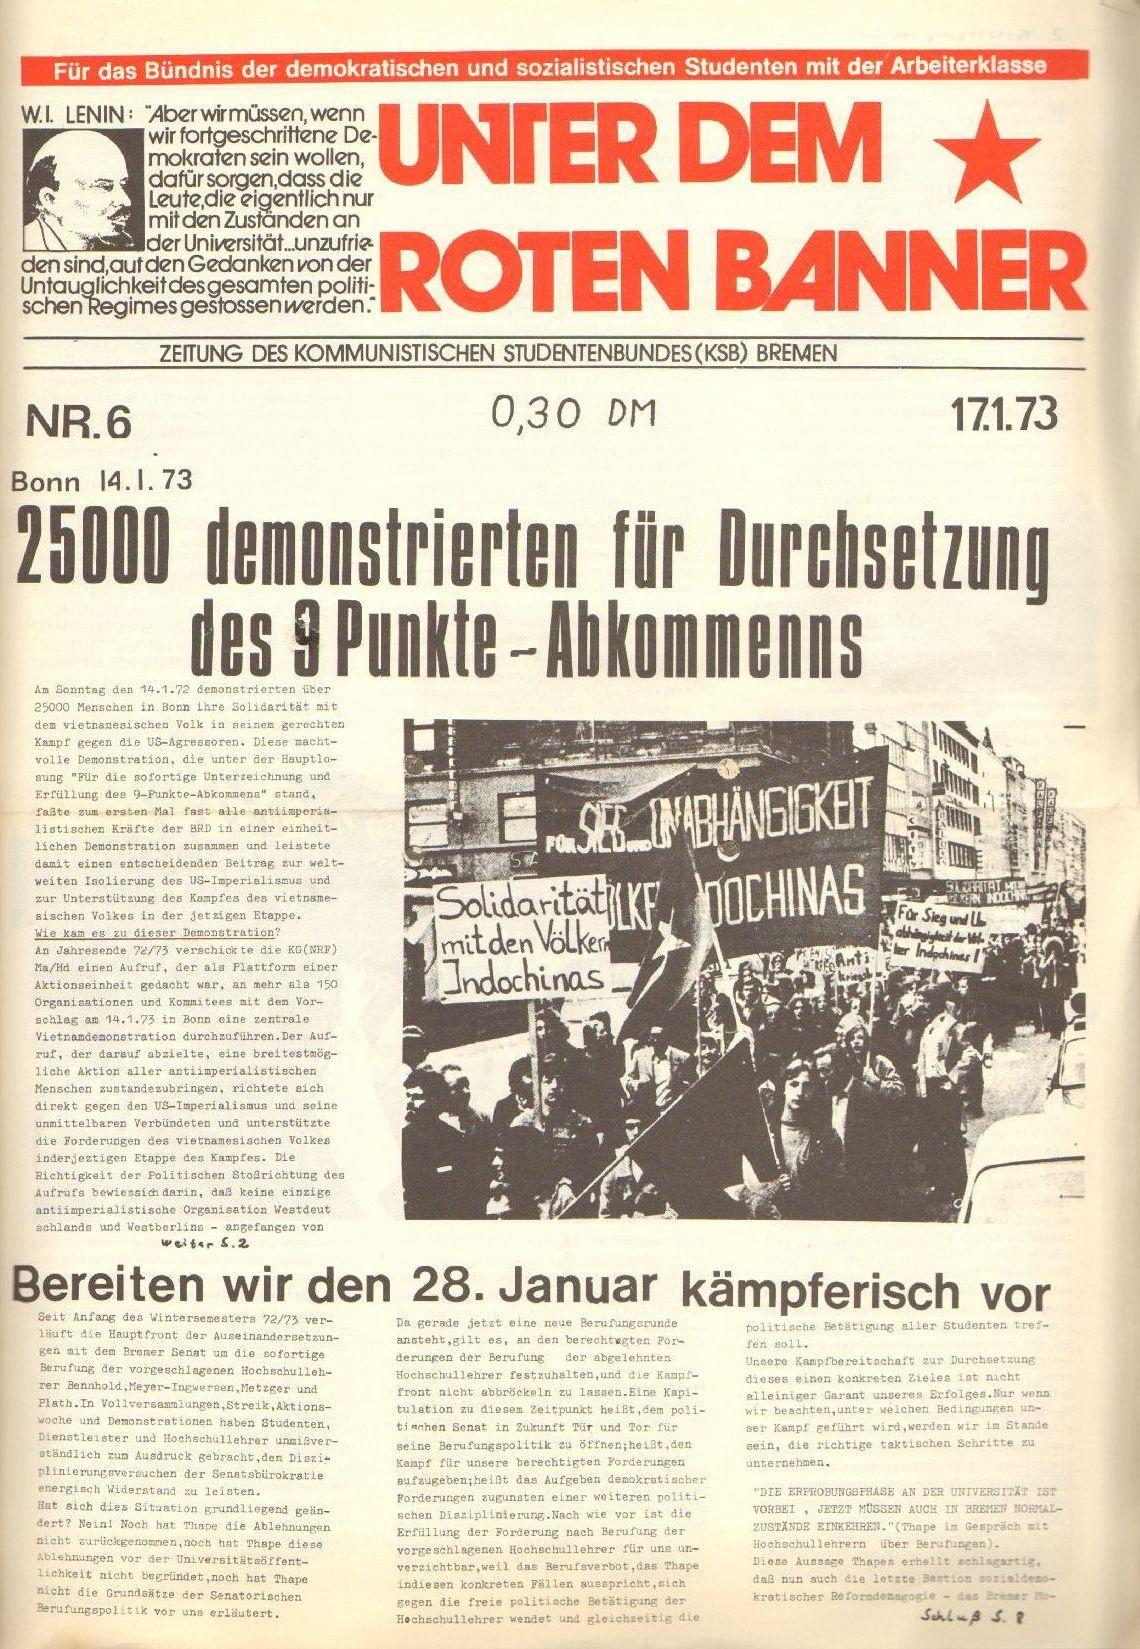 Bremen_Unter_dem_Roten_Banner040